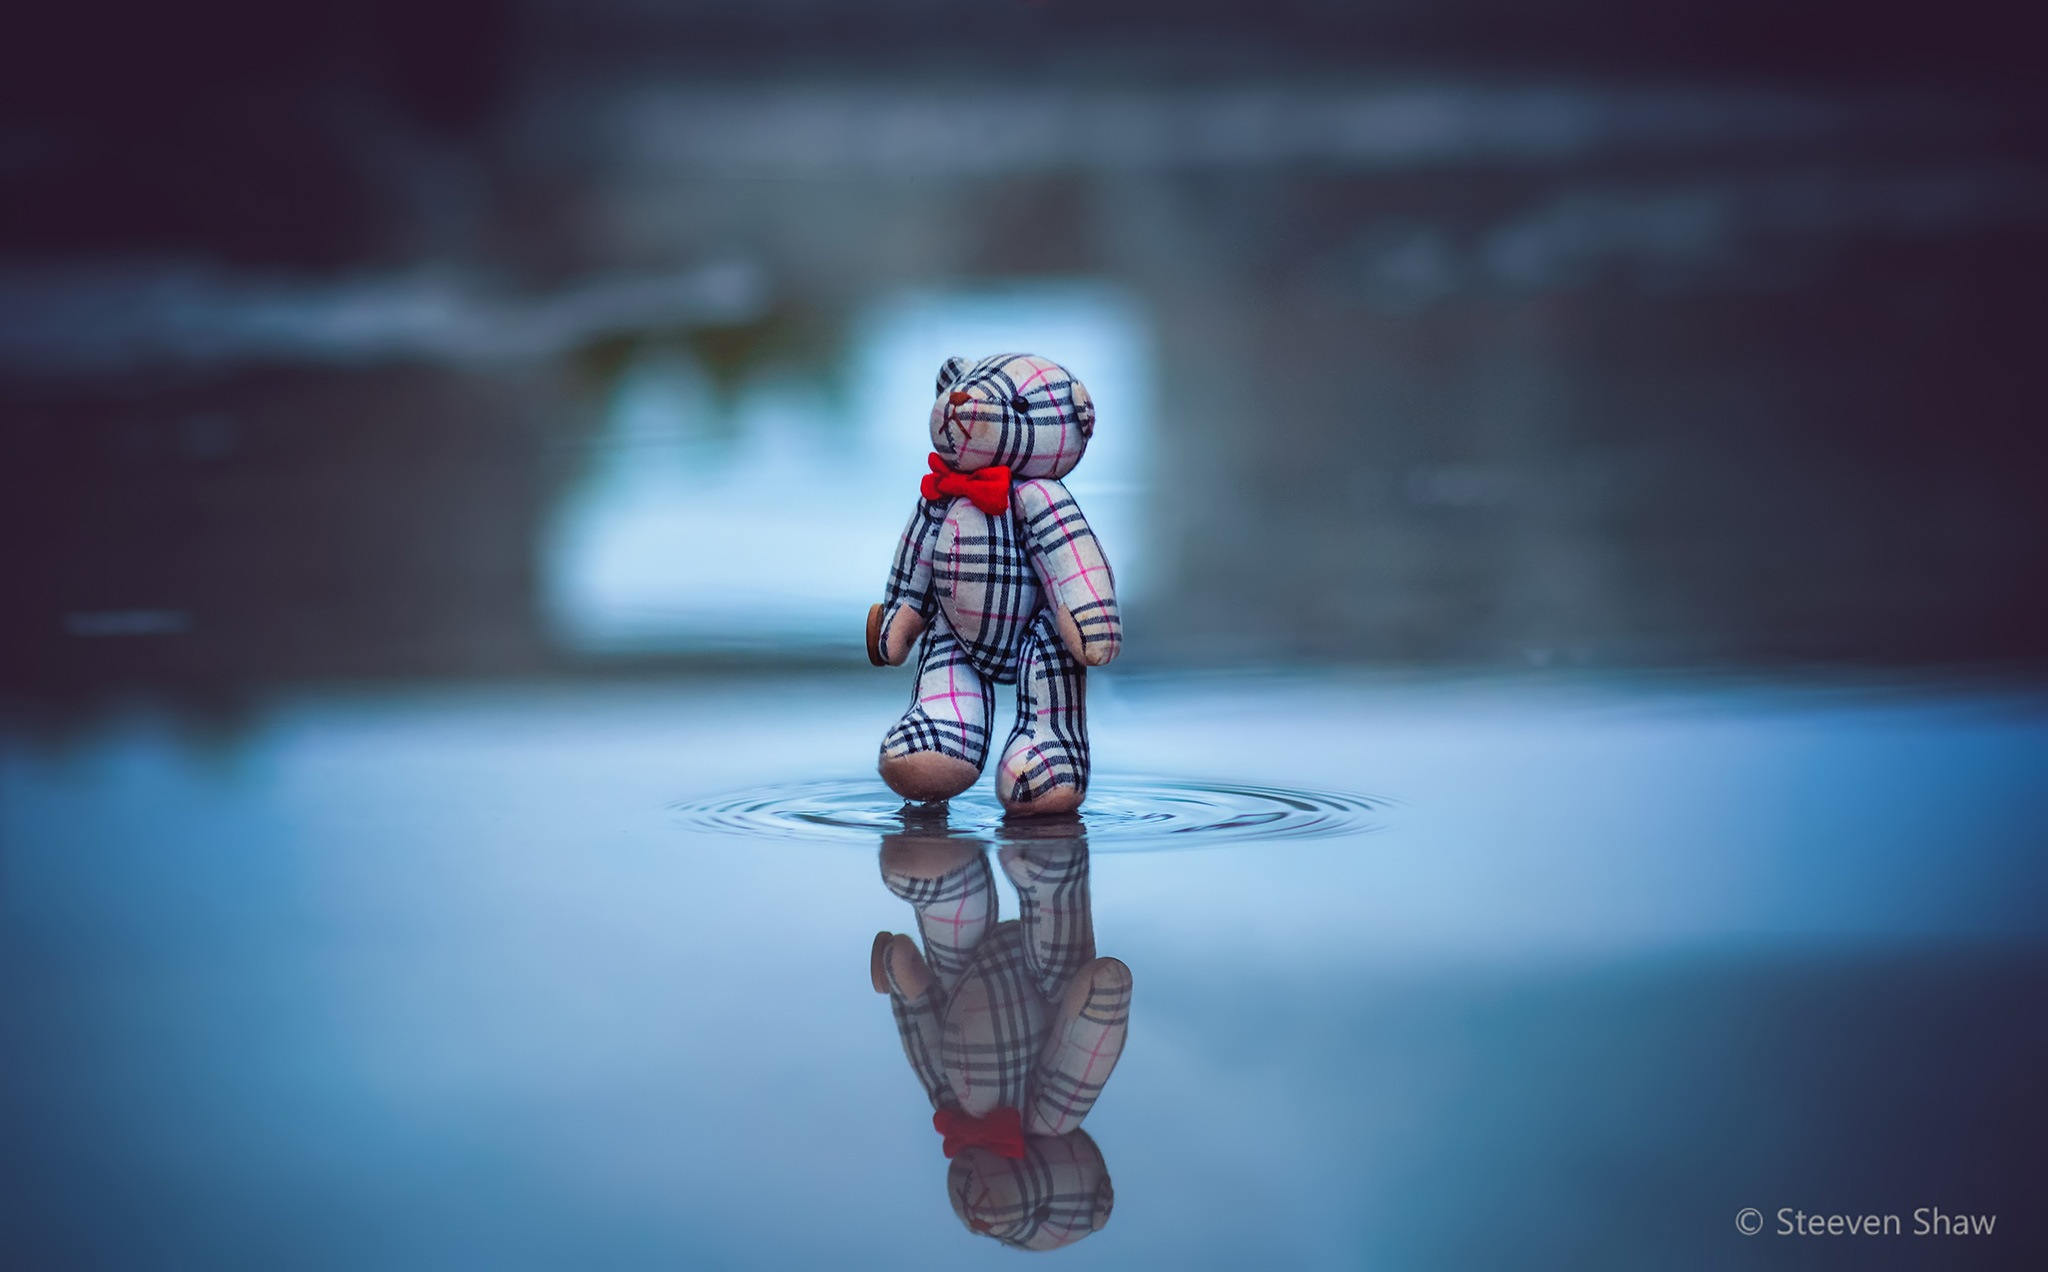 Walking On Water by Steeven Shaw